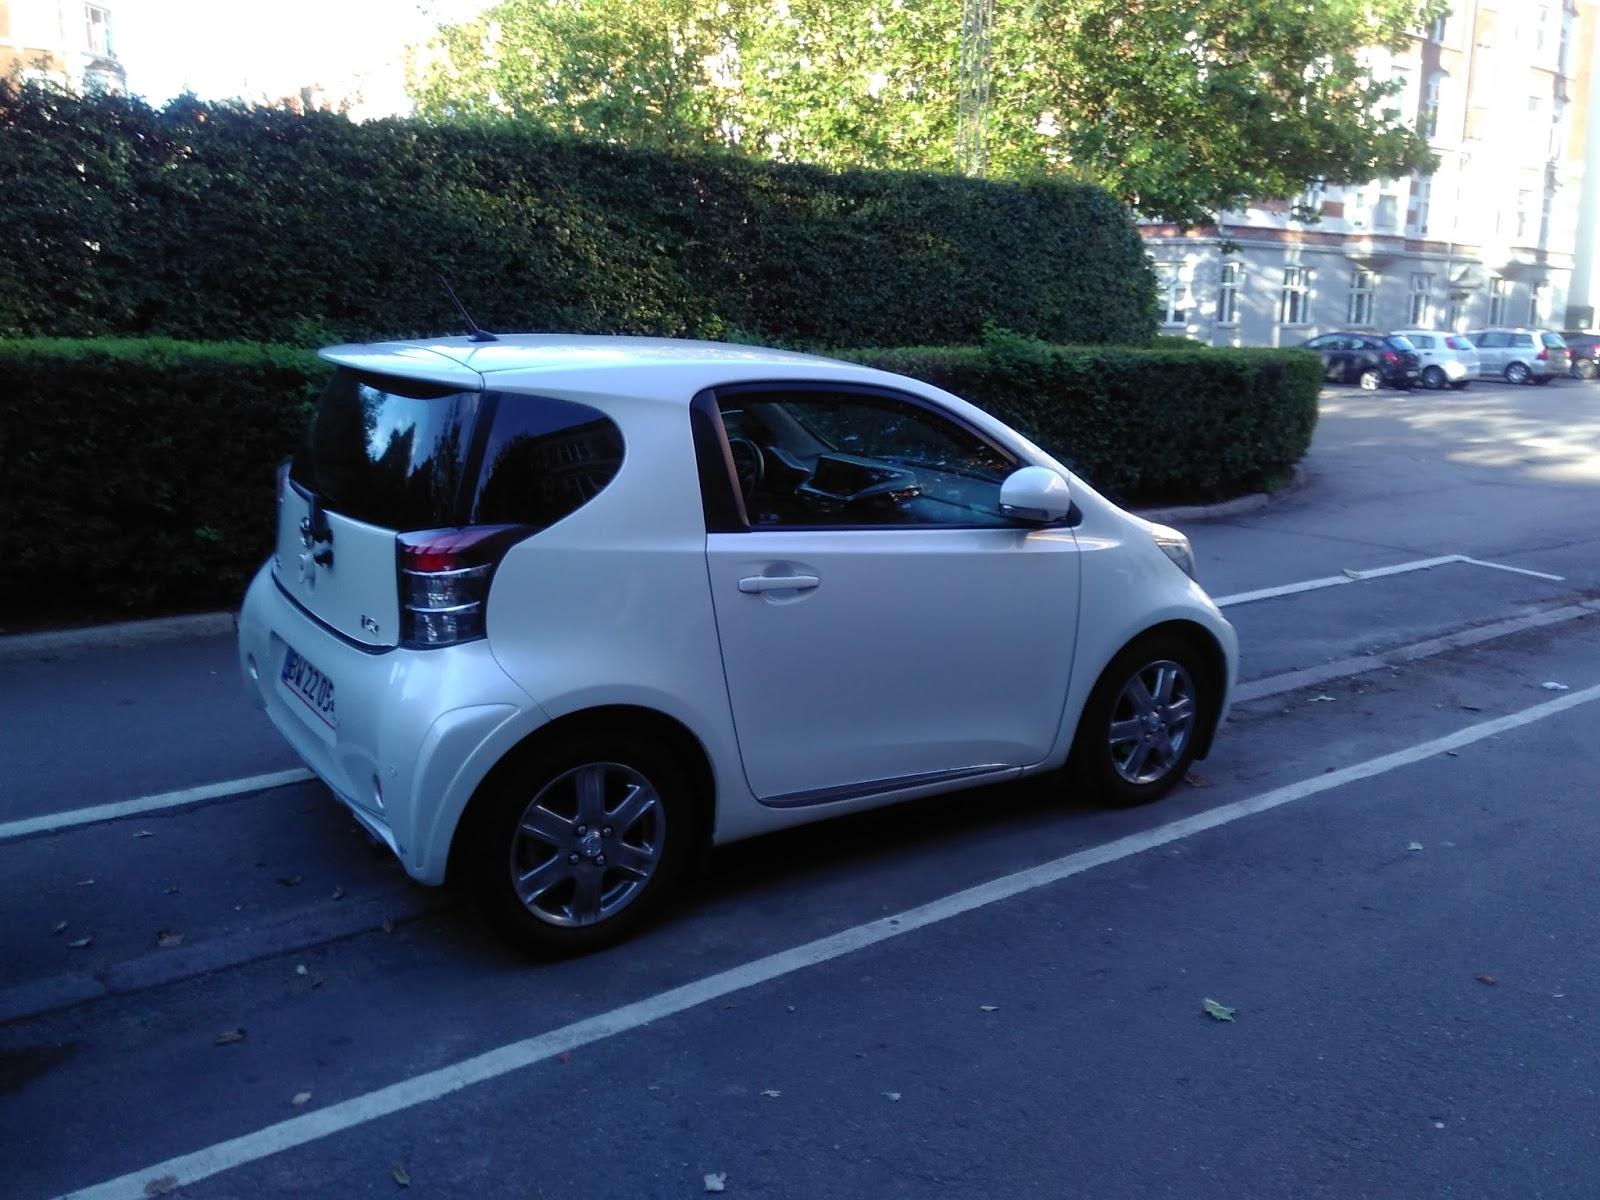 2 Door Cars In Europe Enidhi India Travel Blog